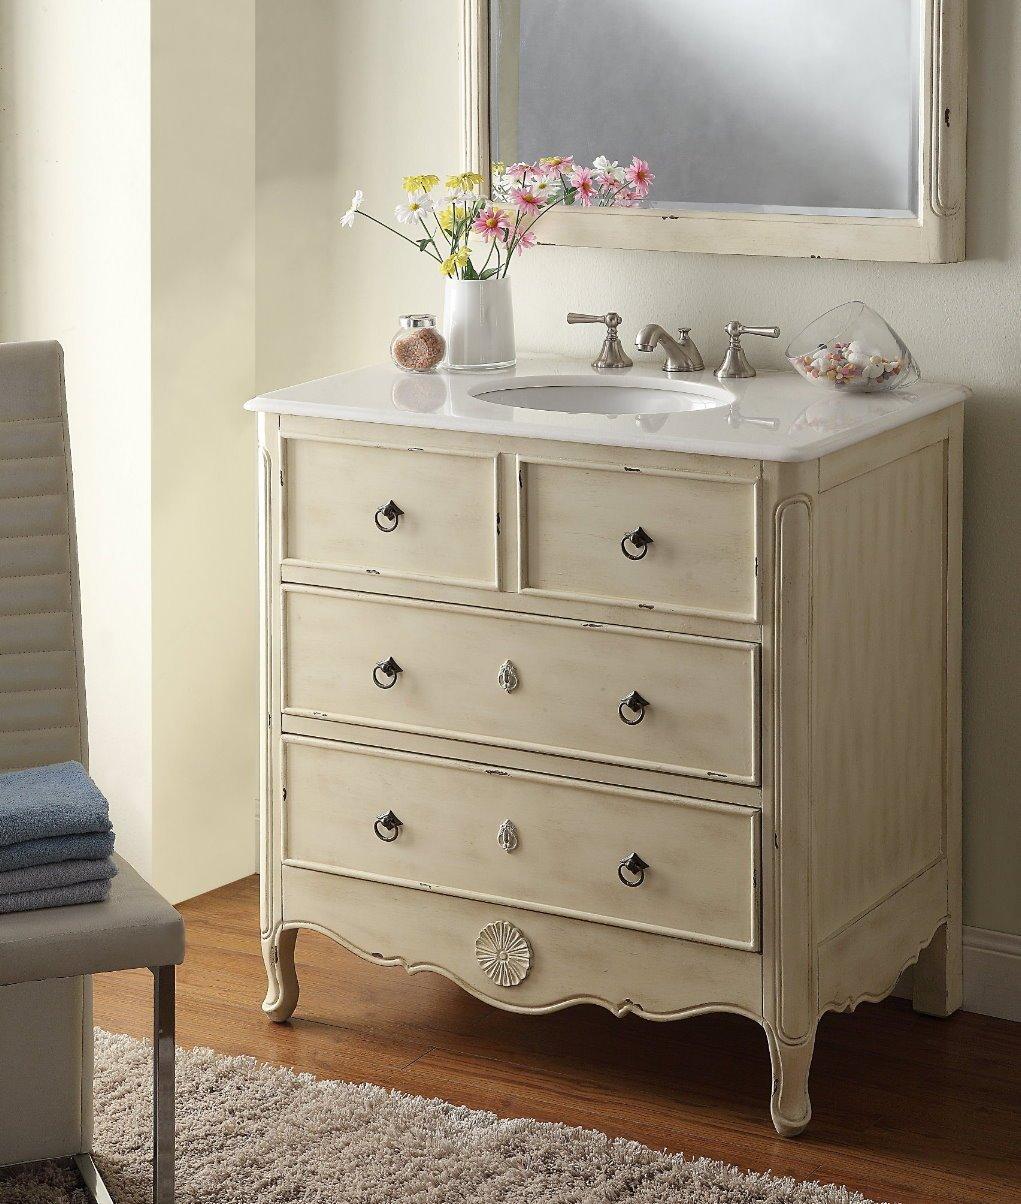 Distressed bathroom cabinet - 34 Cottage Look Daleville Bathroom Sink Vanity Model Hf081wp Distressed Cream Amazon Com